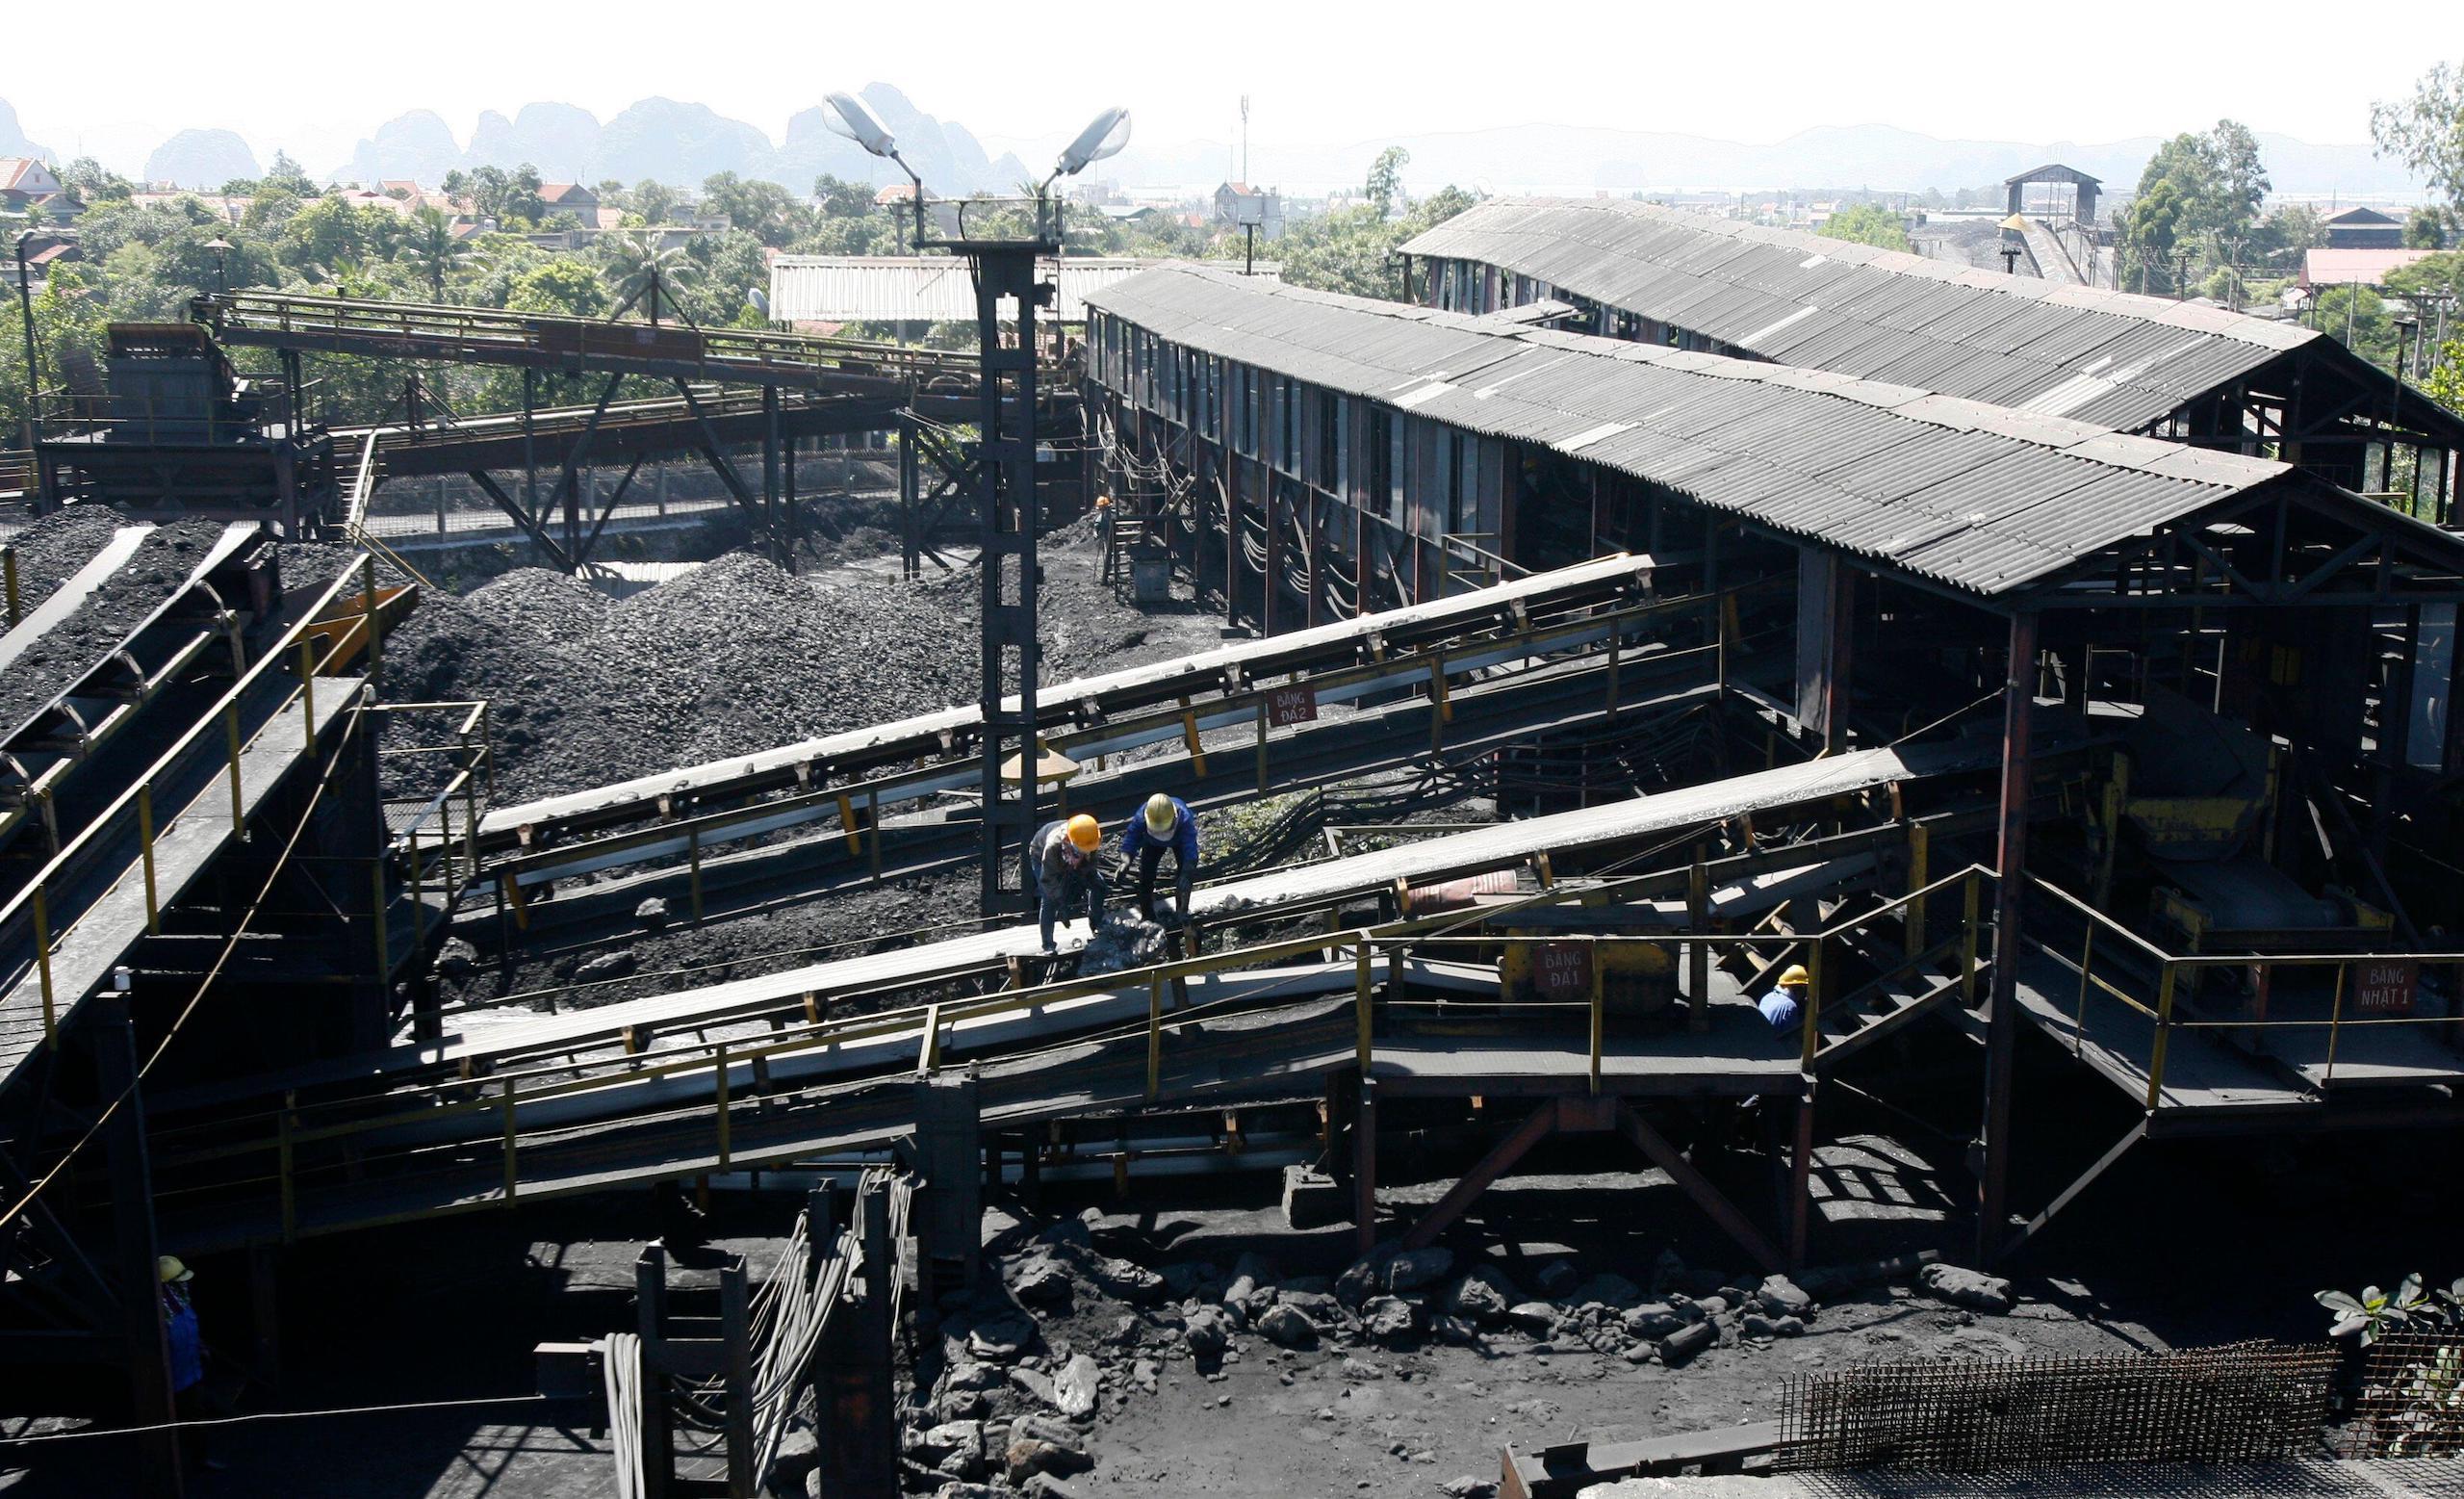 A coal preparation factory at the Coc 6 open-cast coal mine in Vietnam